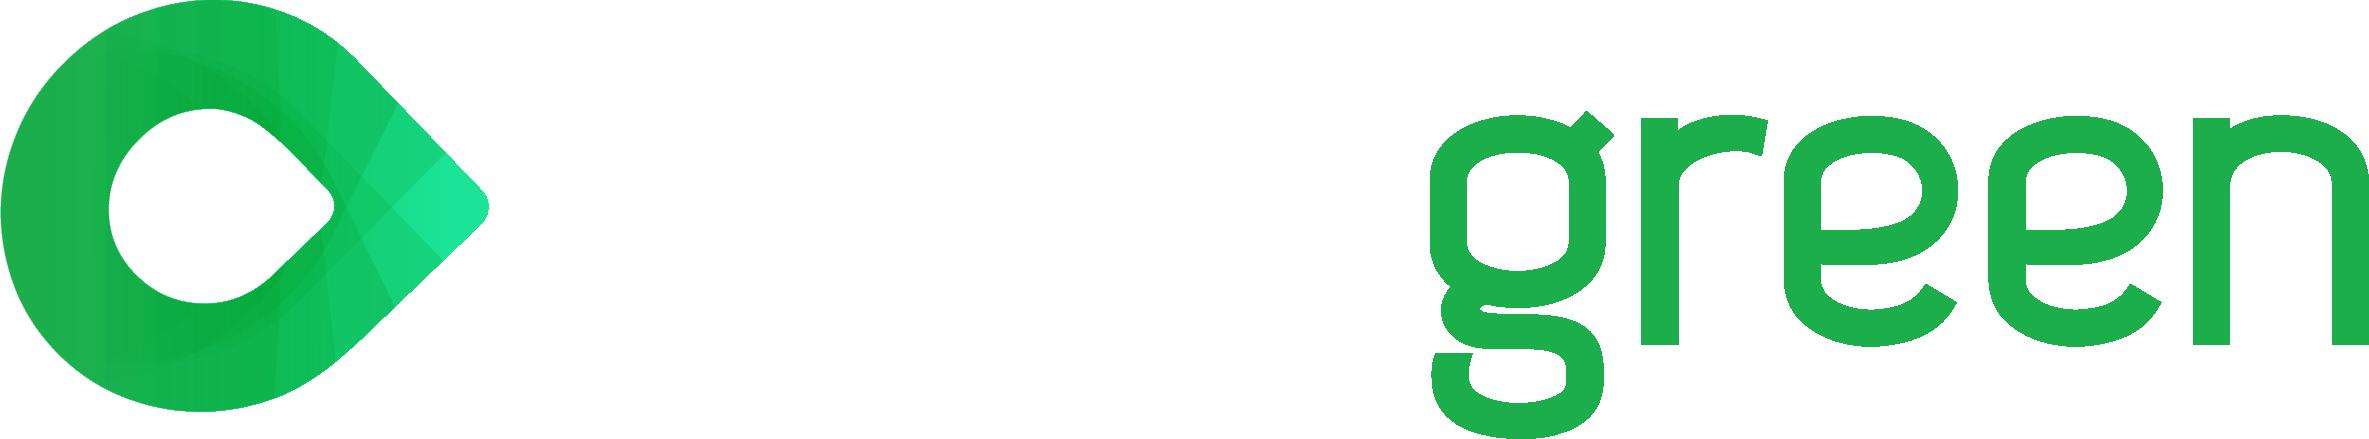 Liquidgreen